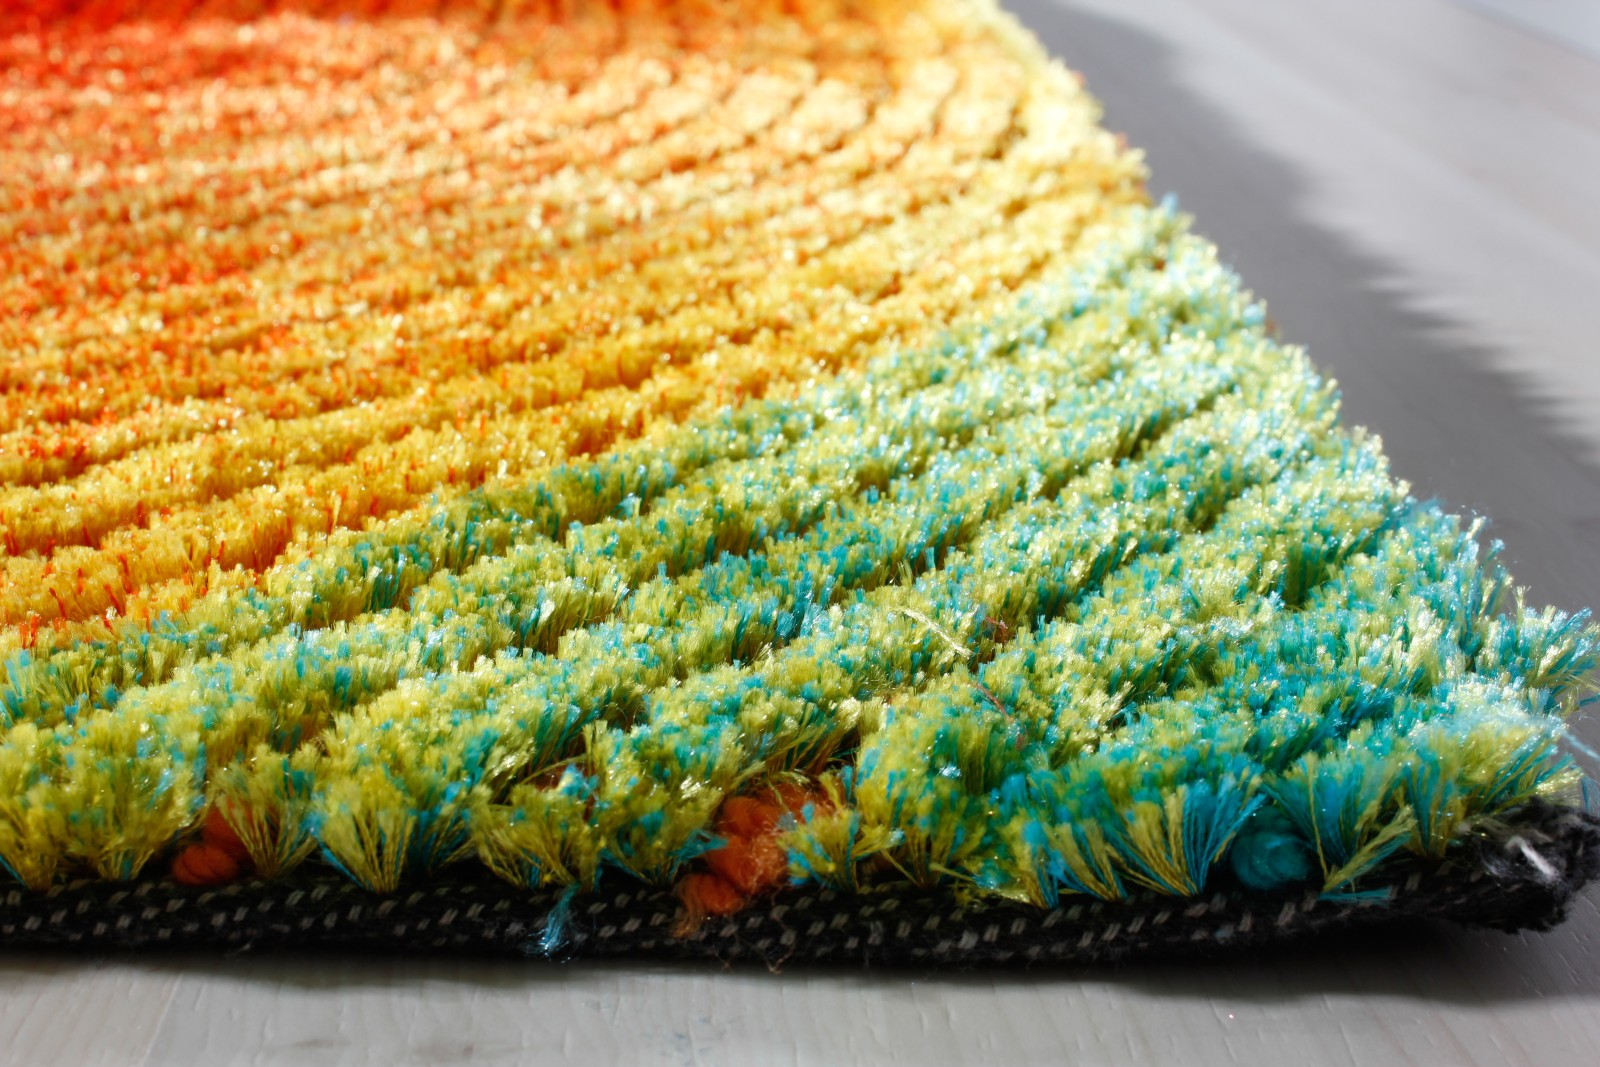 tuft teppich retro design regenbogen bunt sonne planet tuftvelours kontur ebay. Black Bedroom Furniture Sets. Home Design Ideas